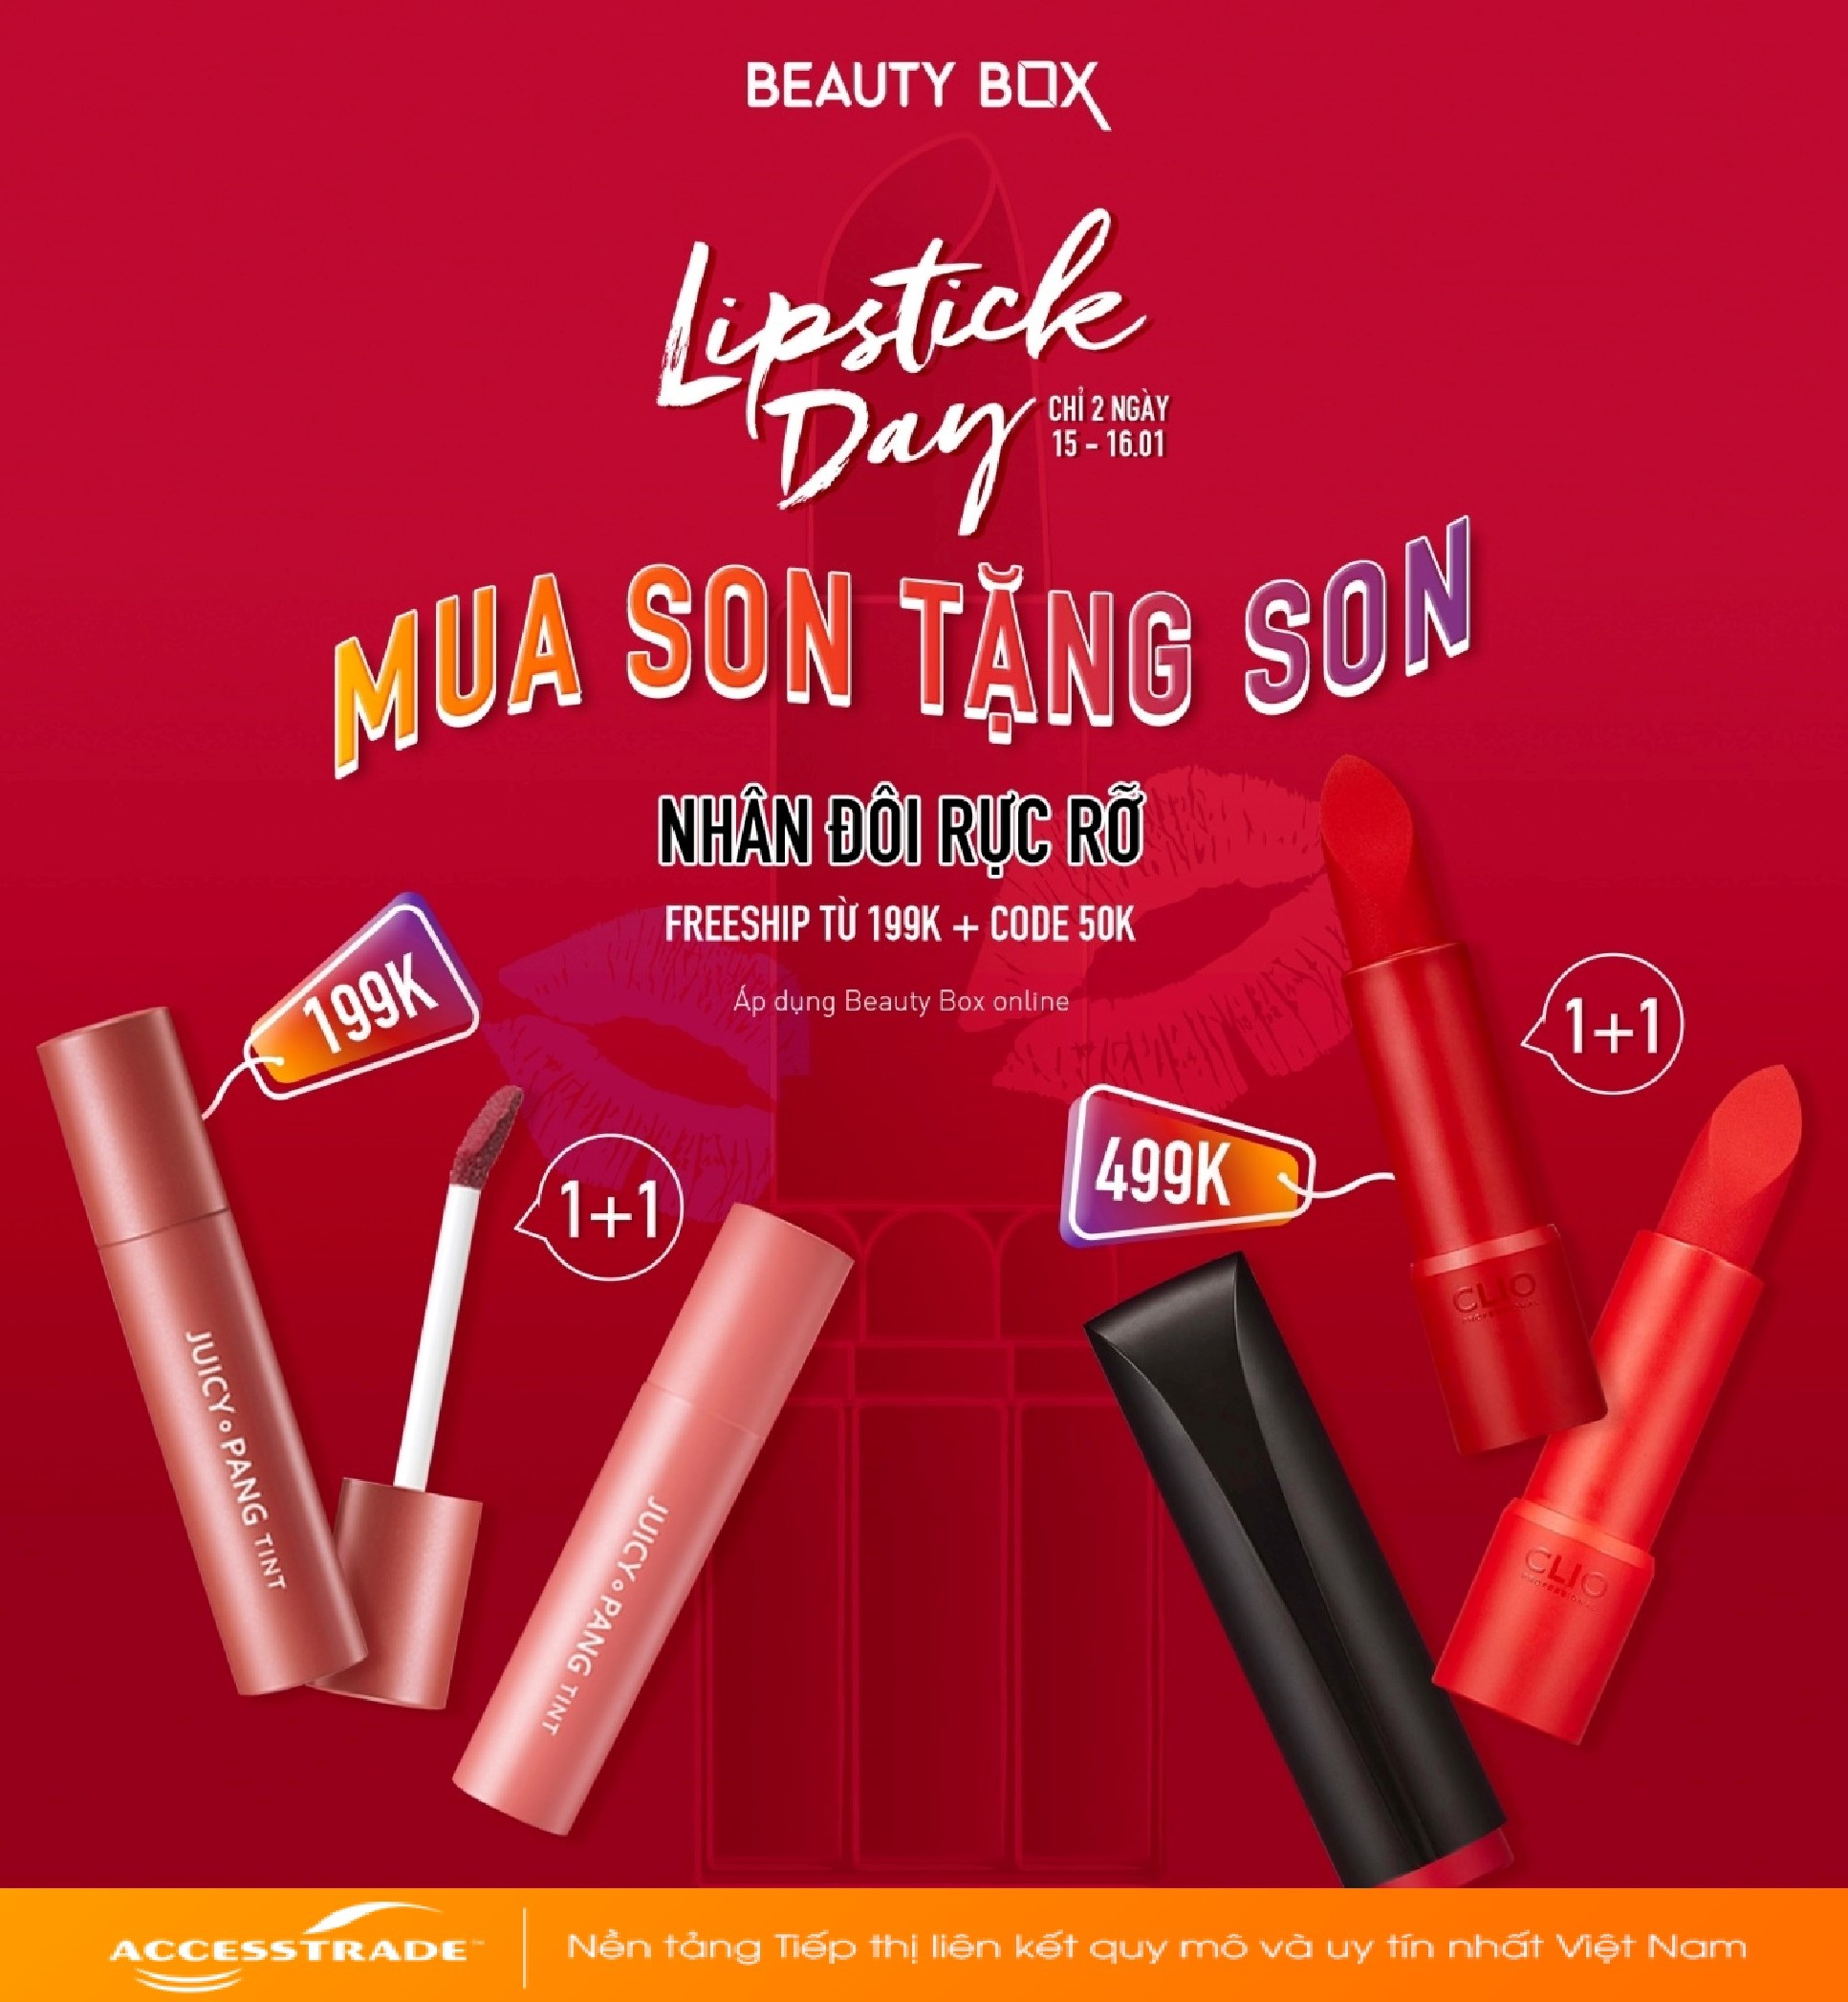 LIPSTICK DAY - MUA SON TẶNG SON